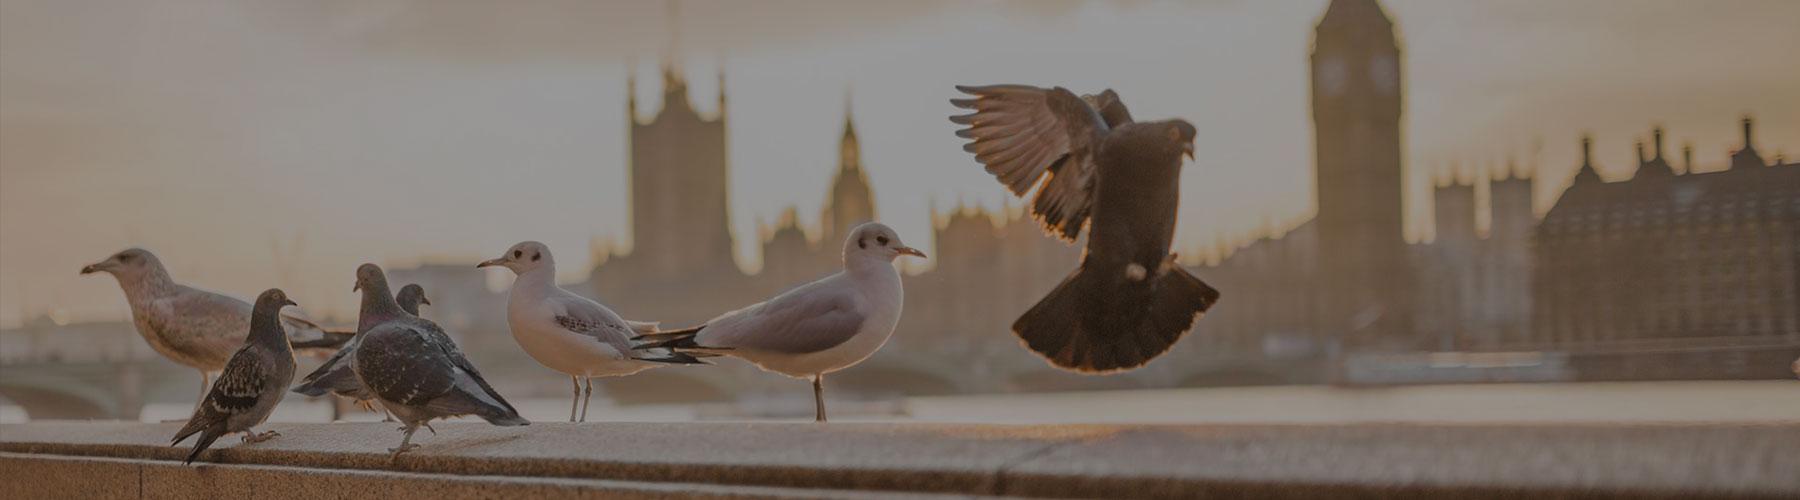 London Pigeons- Elephant Minds